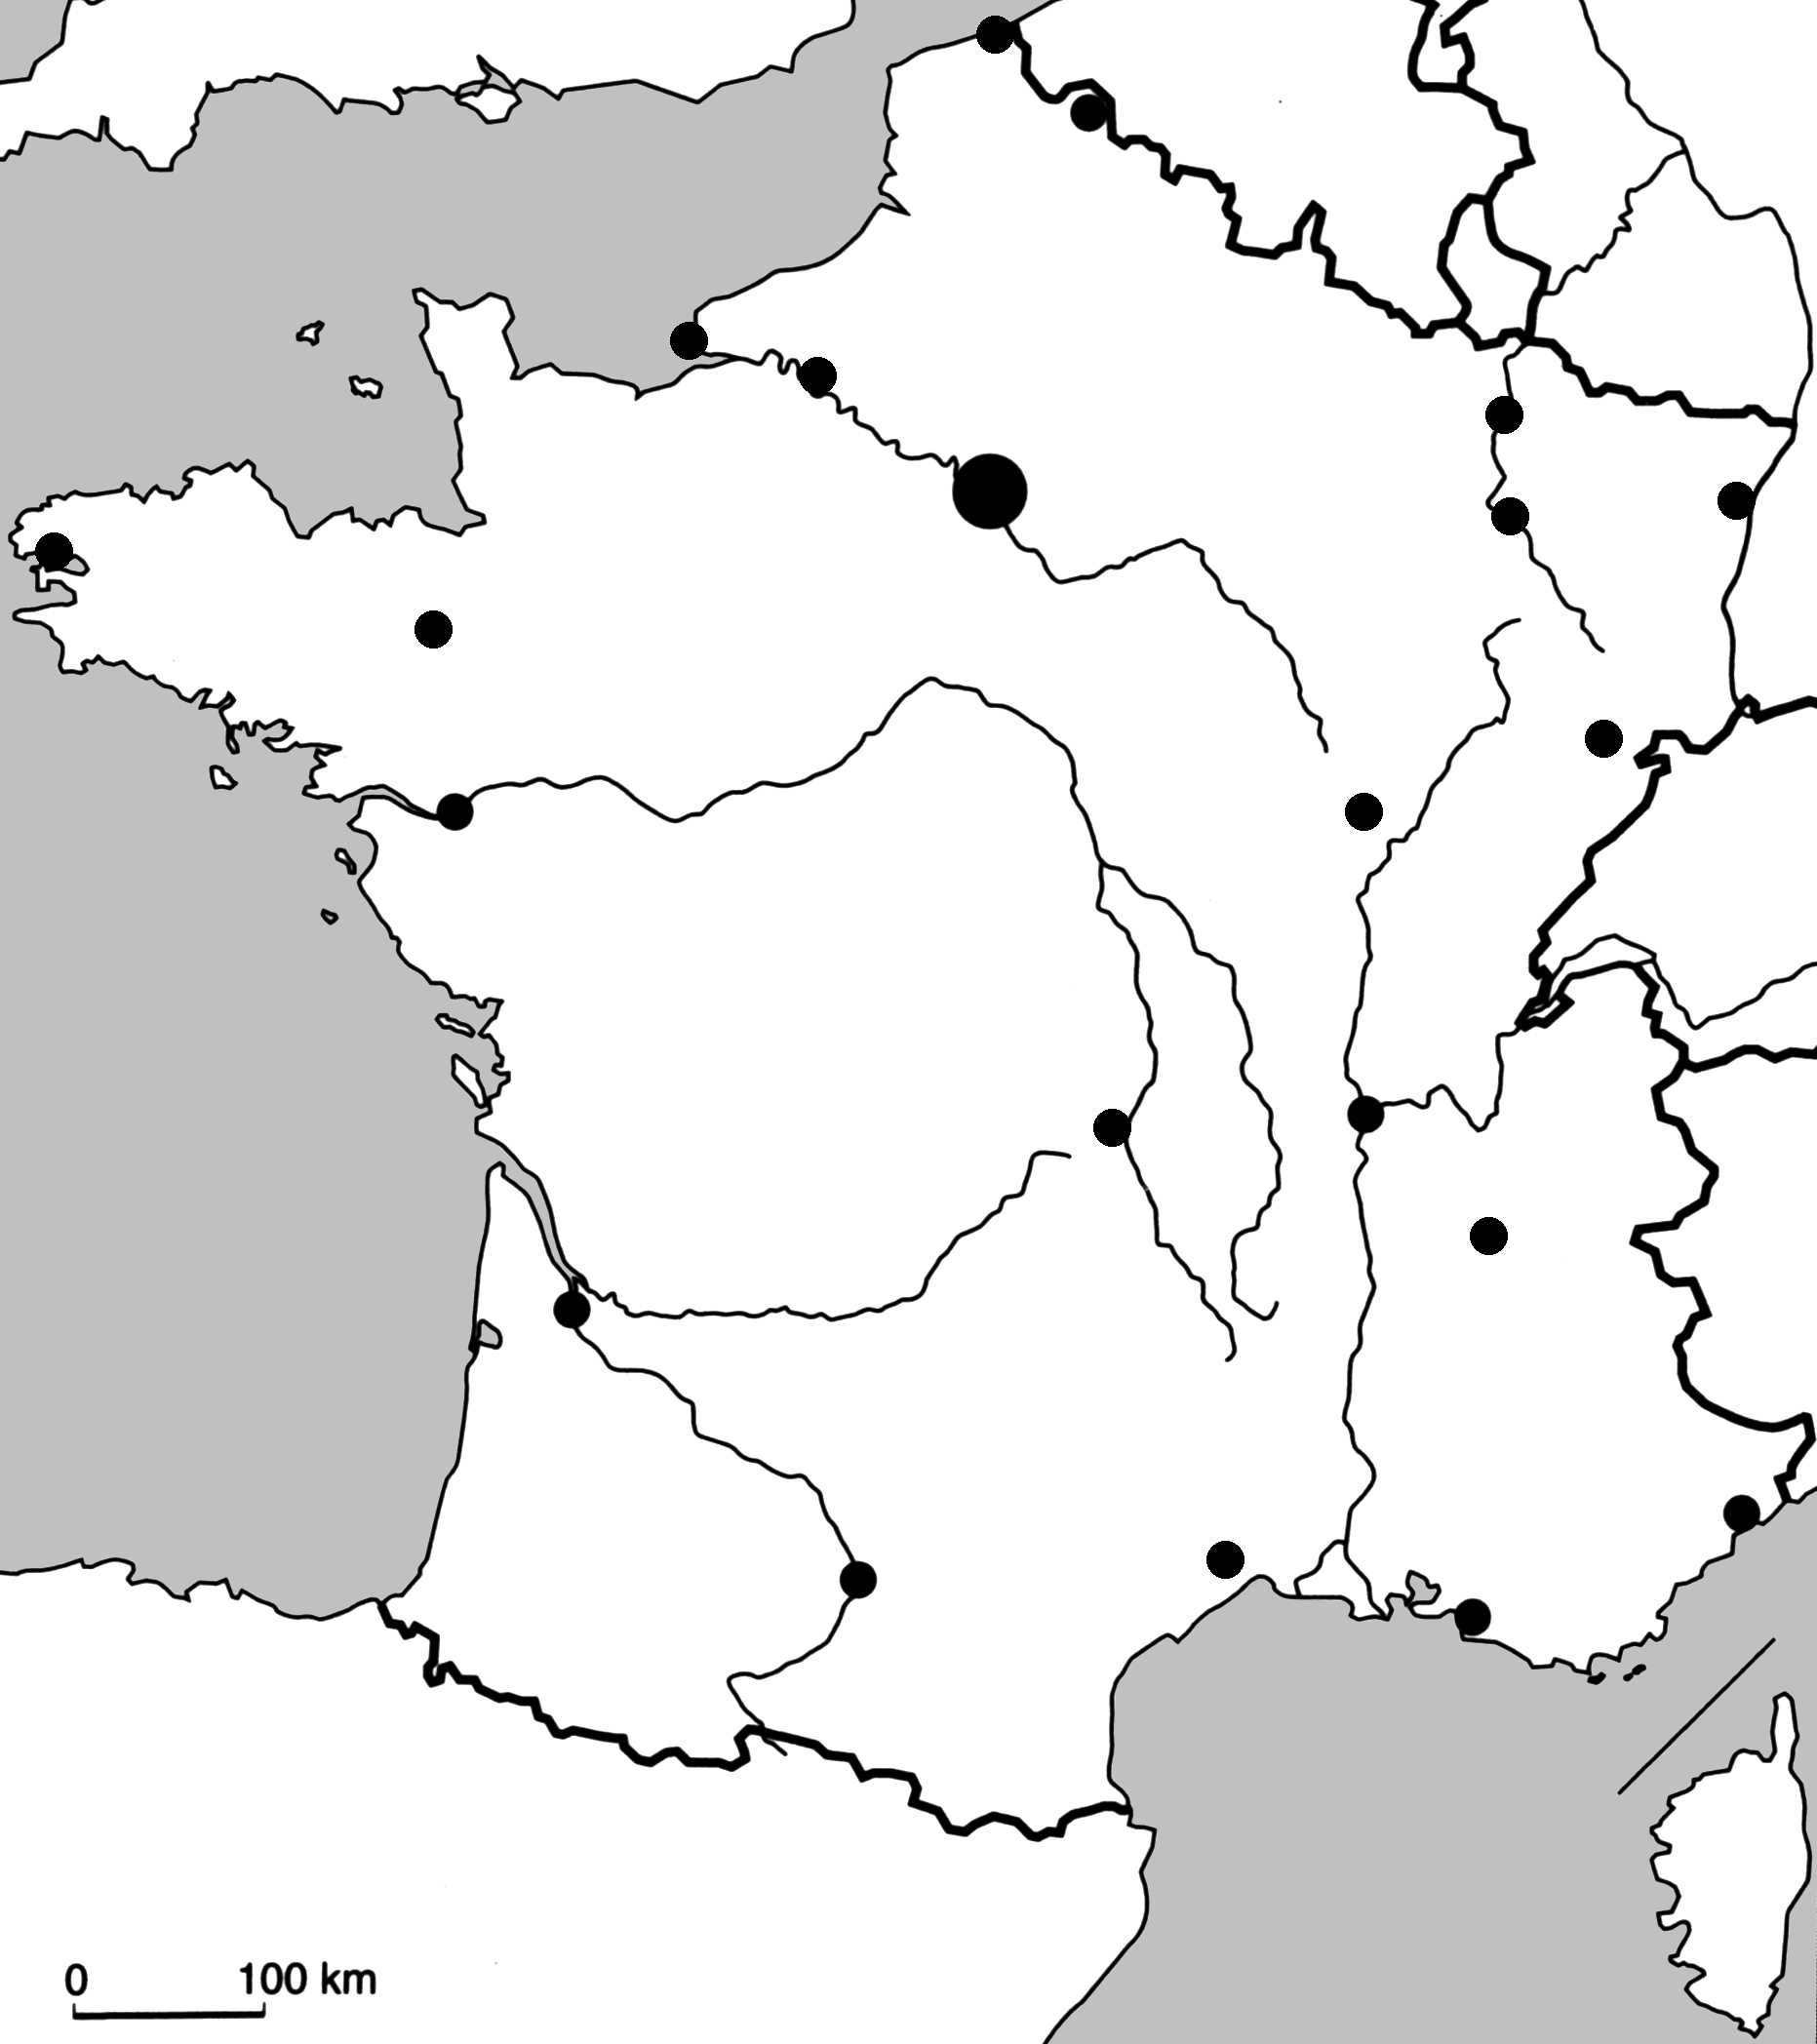 Carte De France Vierge | Carte France Vierge, Fleuve De dedans Fond De Carte France Fleuves